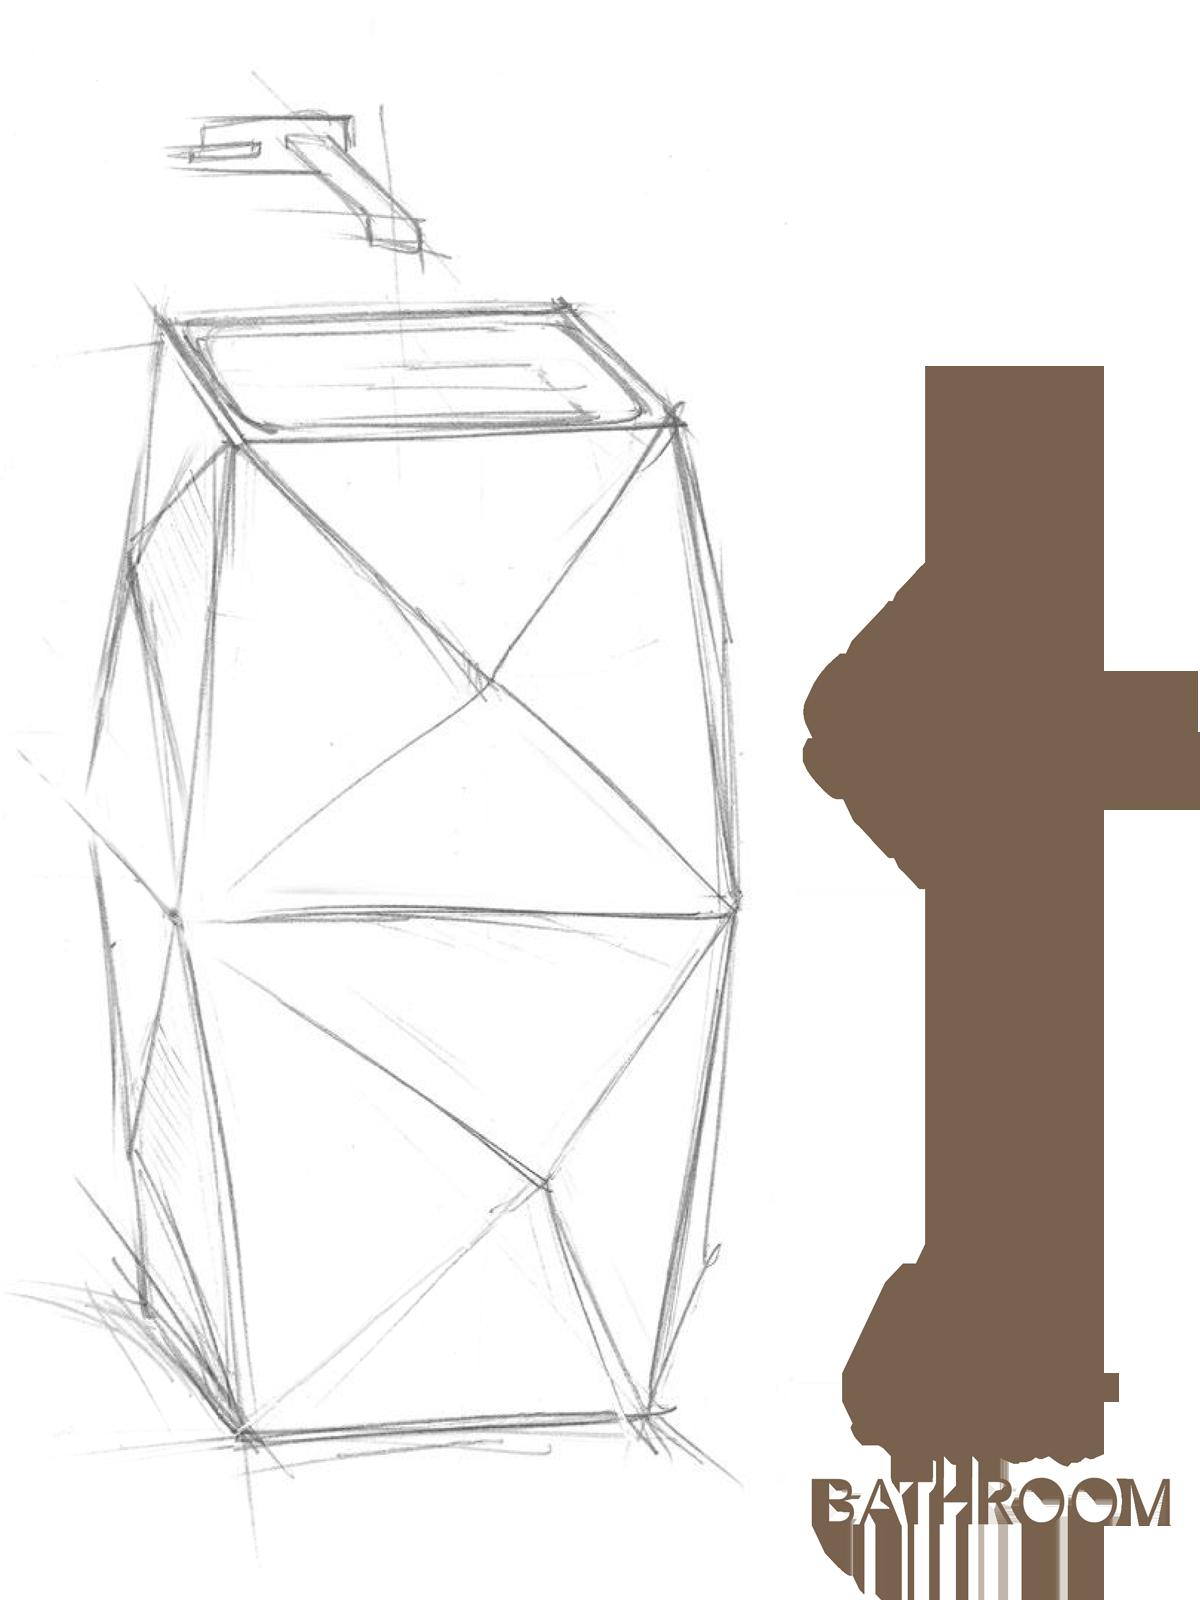 Serafini Marmi Luxury Marble Bath Catalogue 2018 Equip Bathrooms